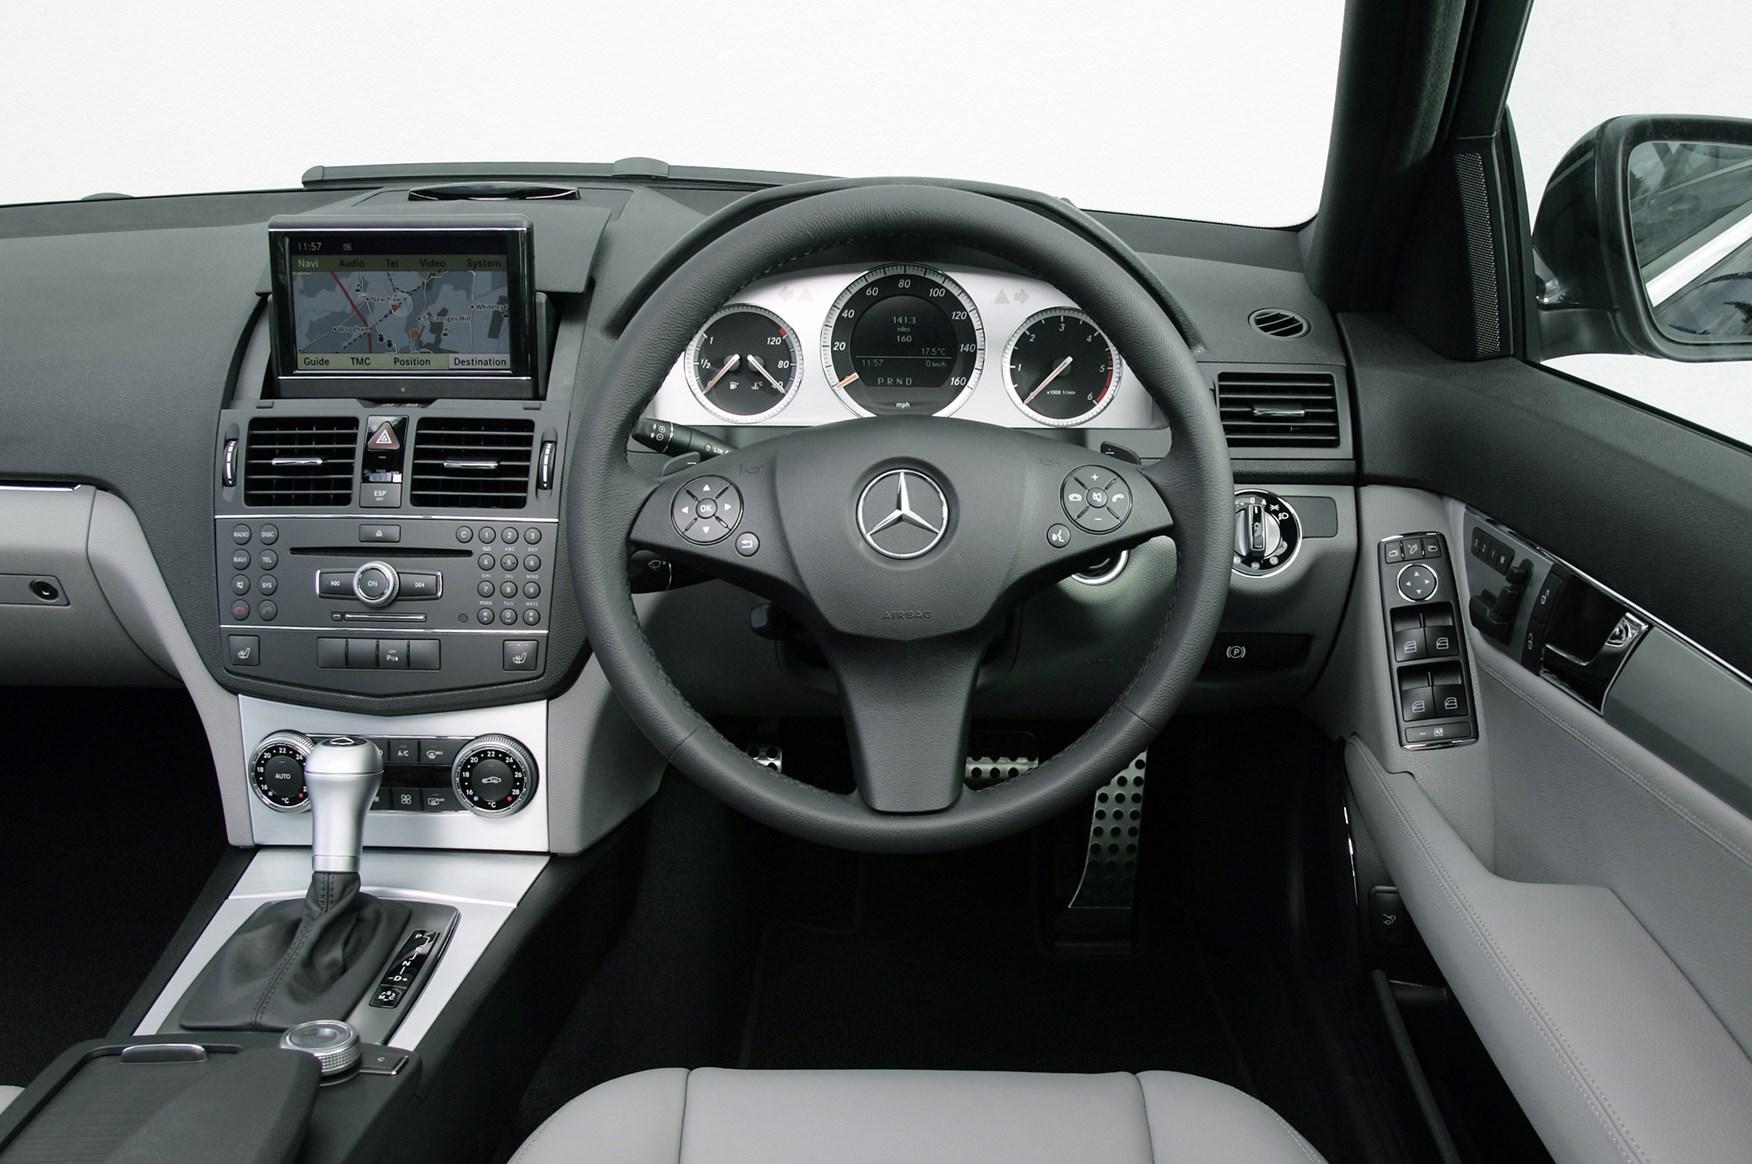 Mercedes benz c class saloon 2007 2014 photos parkers - 2014 mercedes c class interior ...